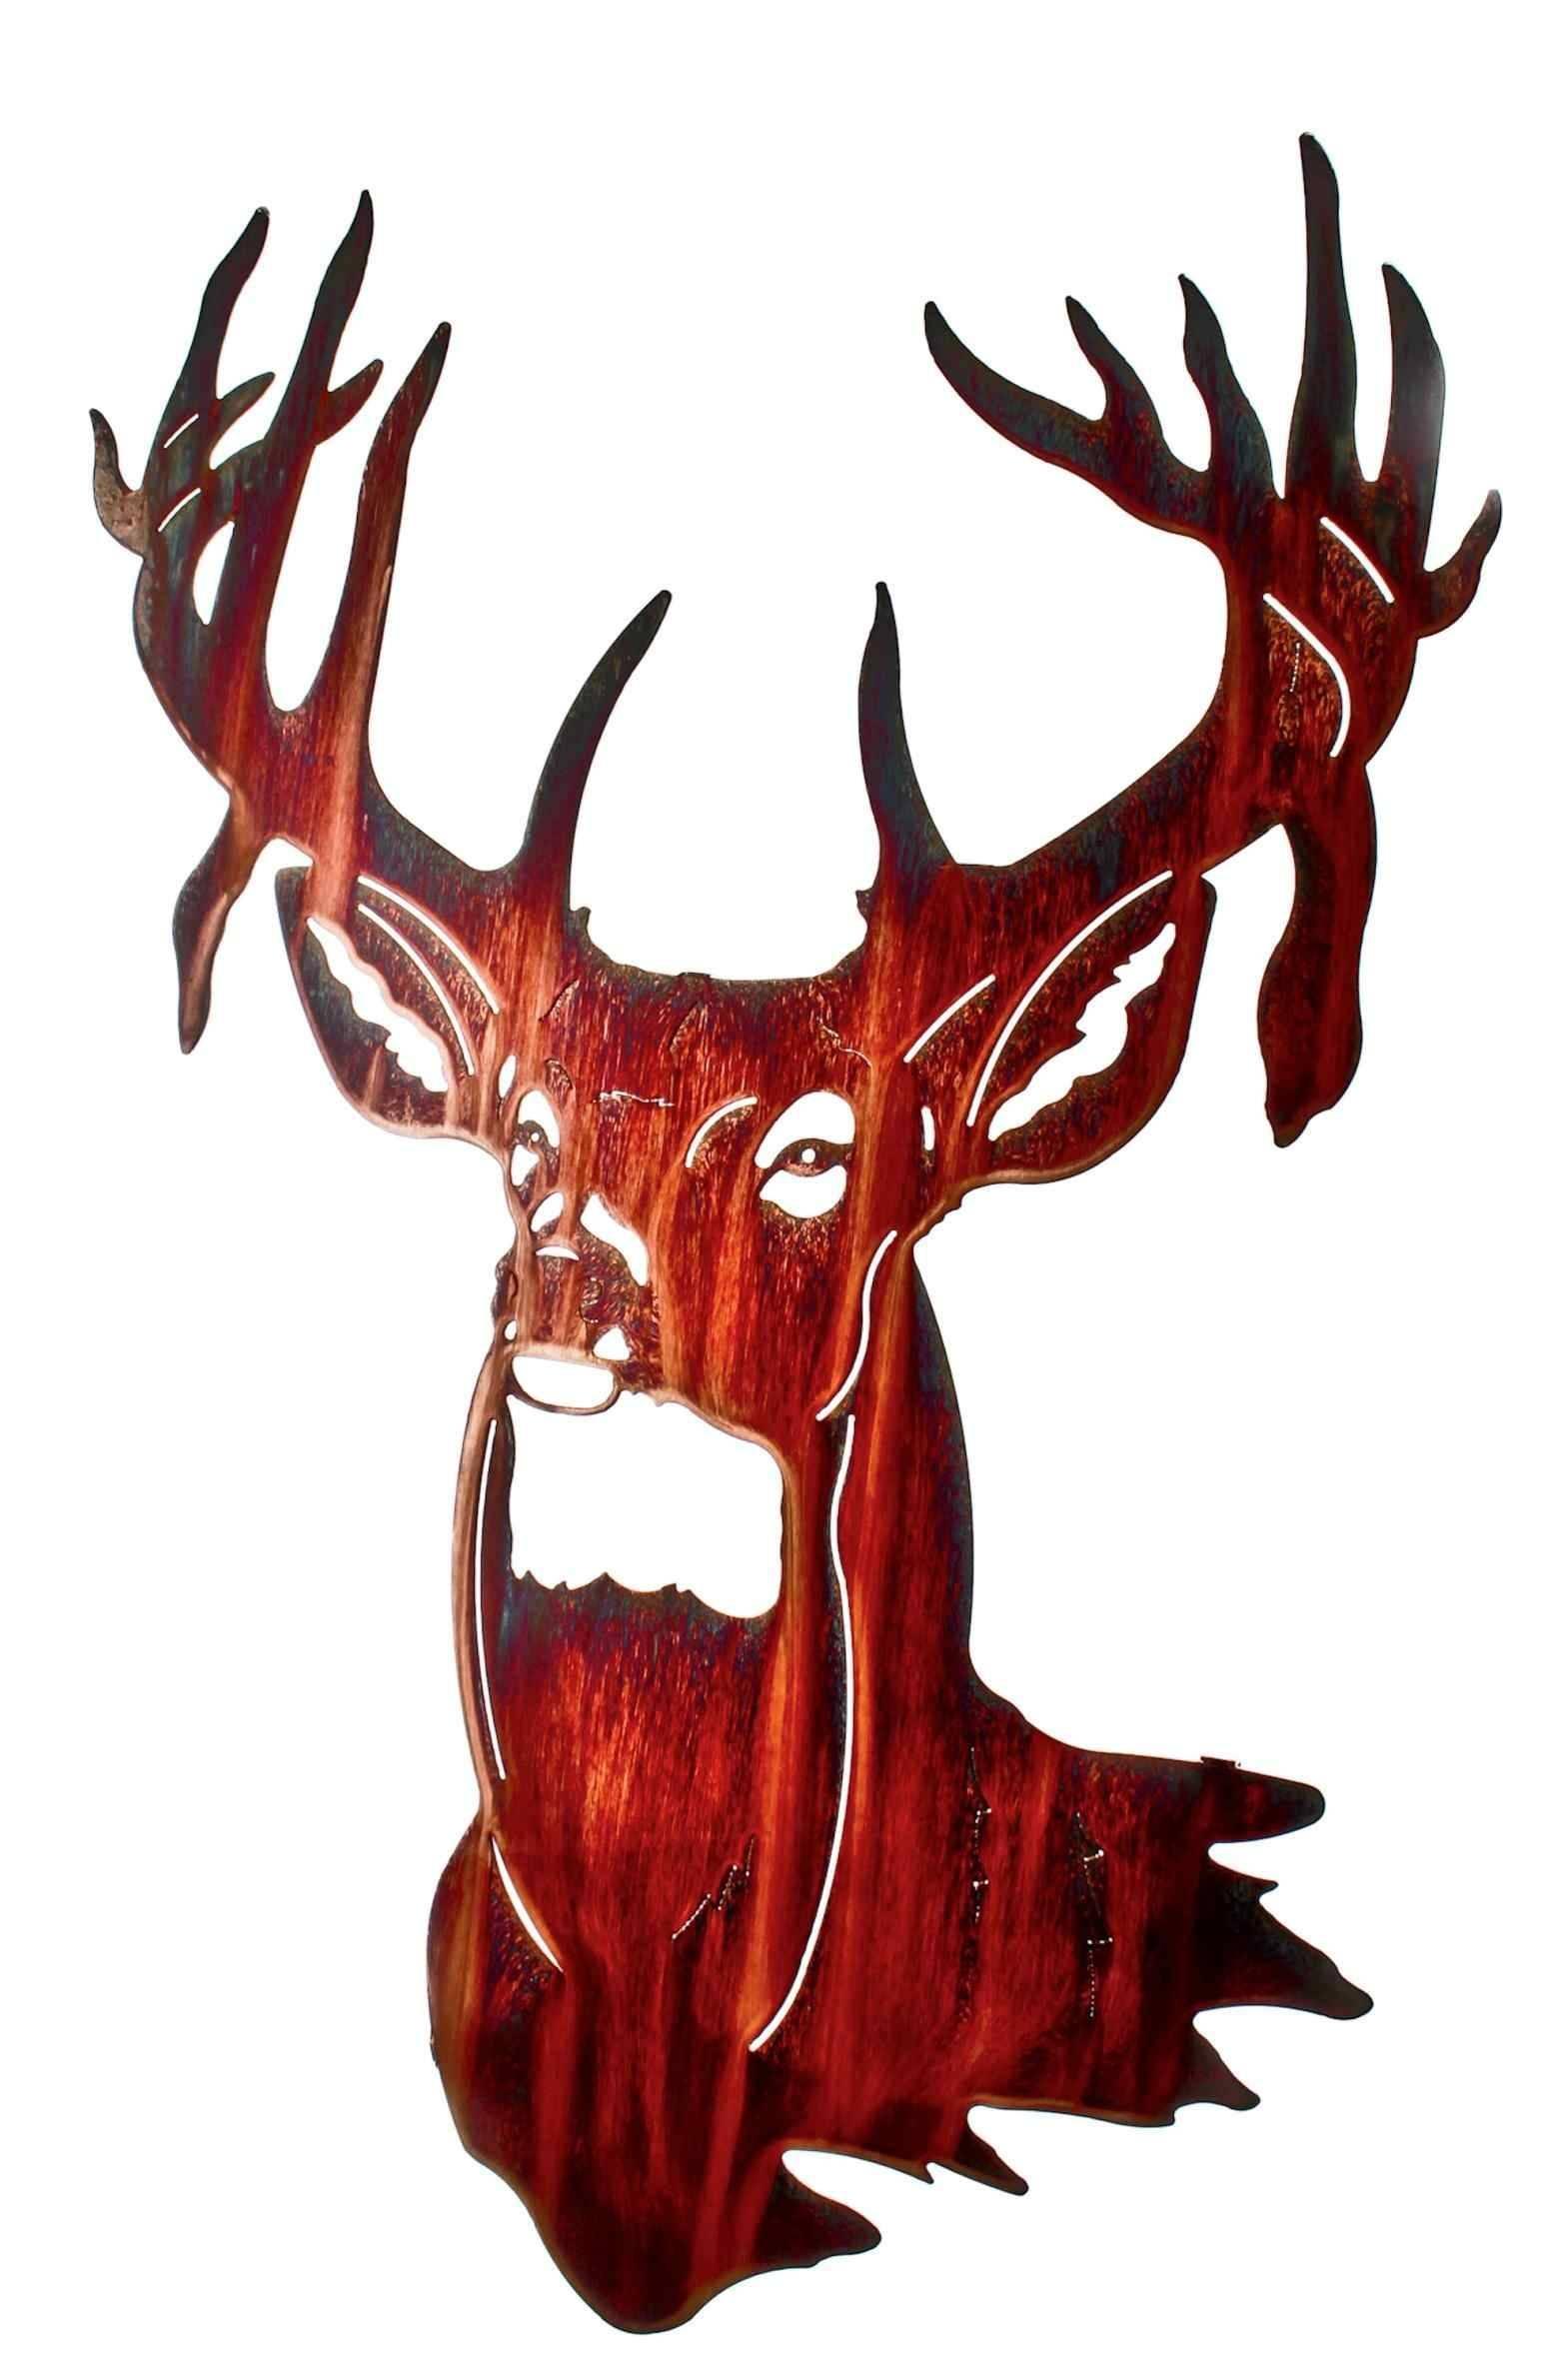 Lazart Metal Wall Art | Home Interior Decor Throughout Most Popular Bear Metal Wall Art (View 17 of 20)